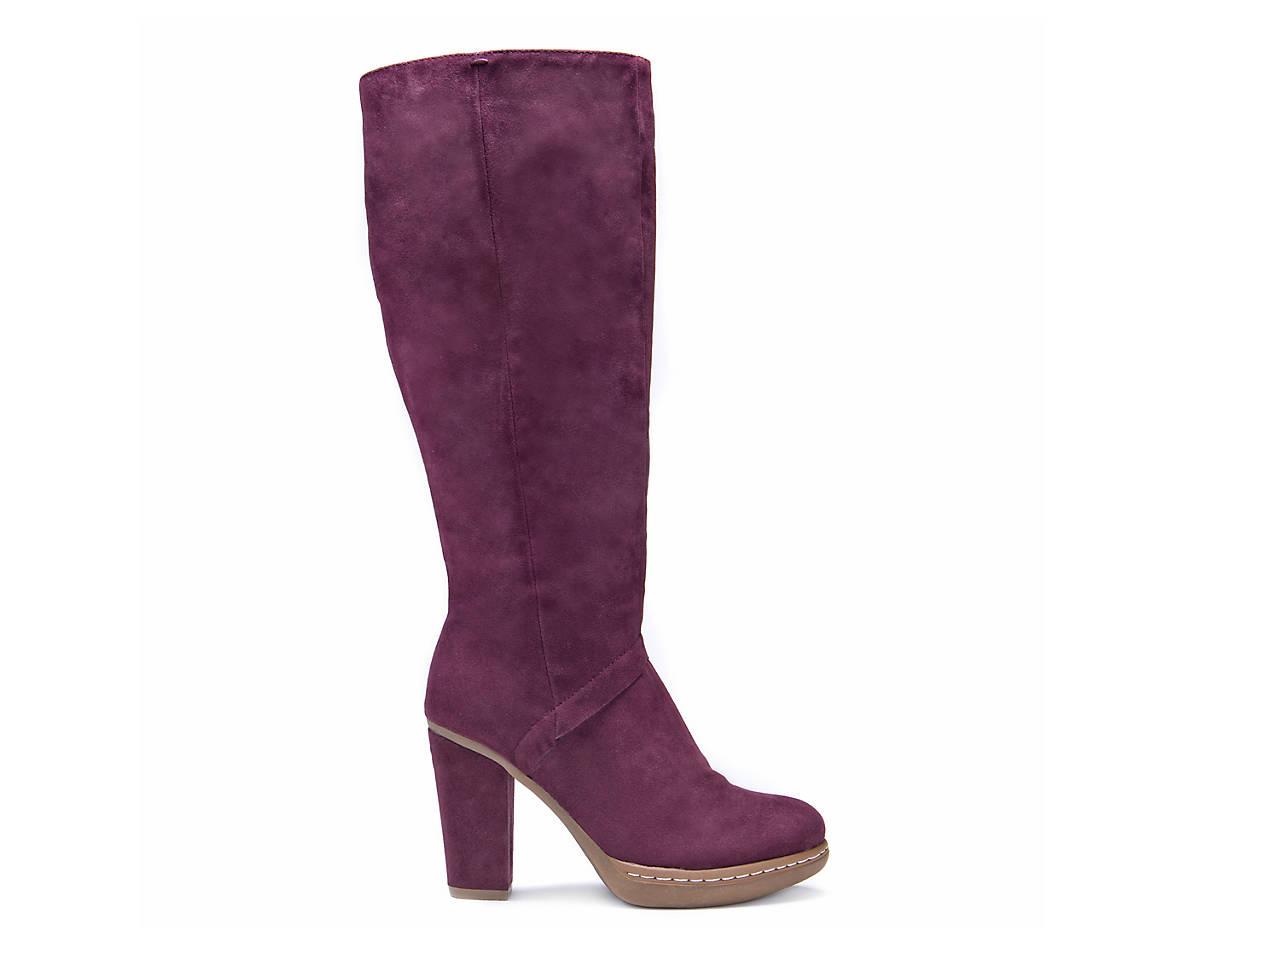 MUK LUKS Nellie Women's ... Water-Resistant Knee-High Boots SObBTMrXIo